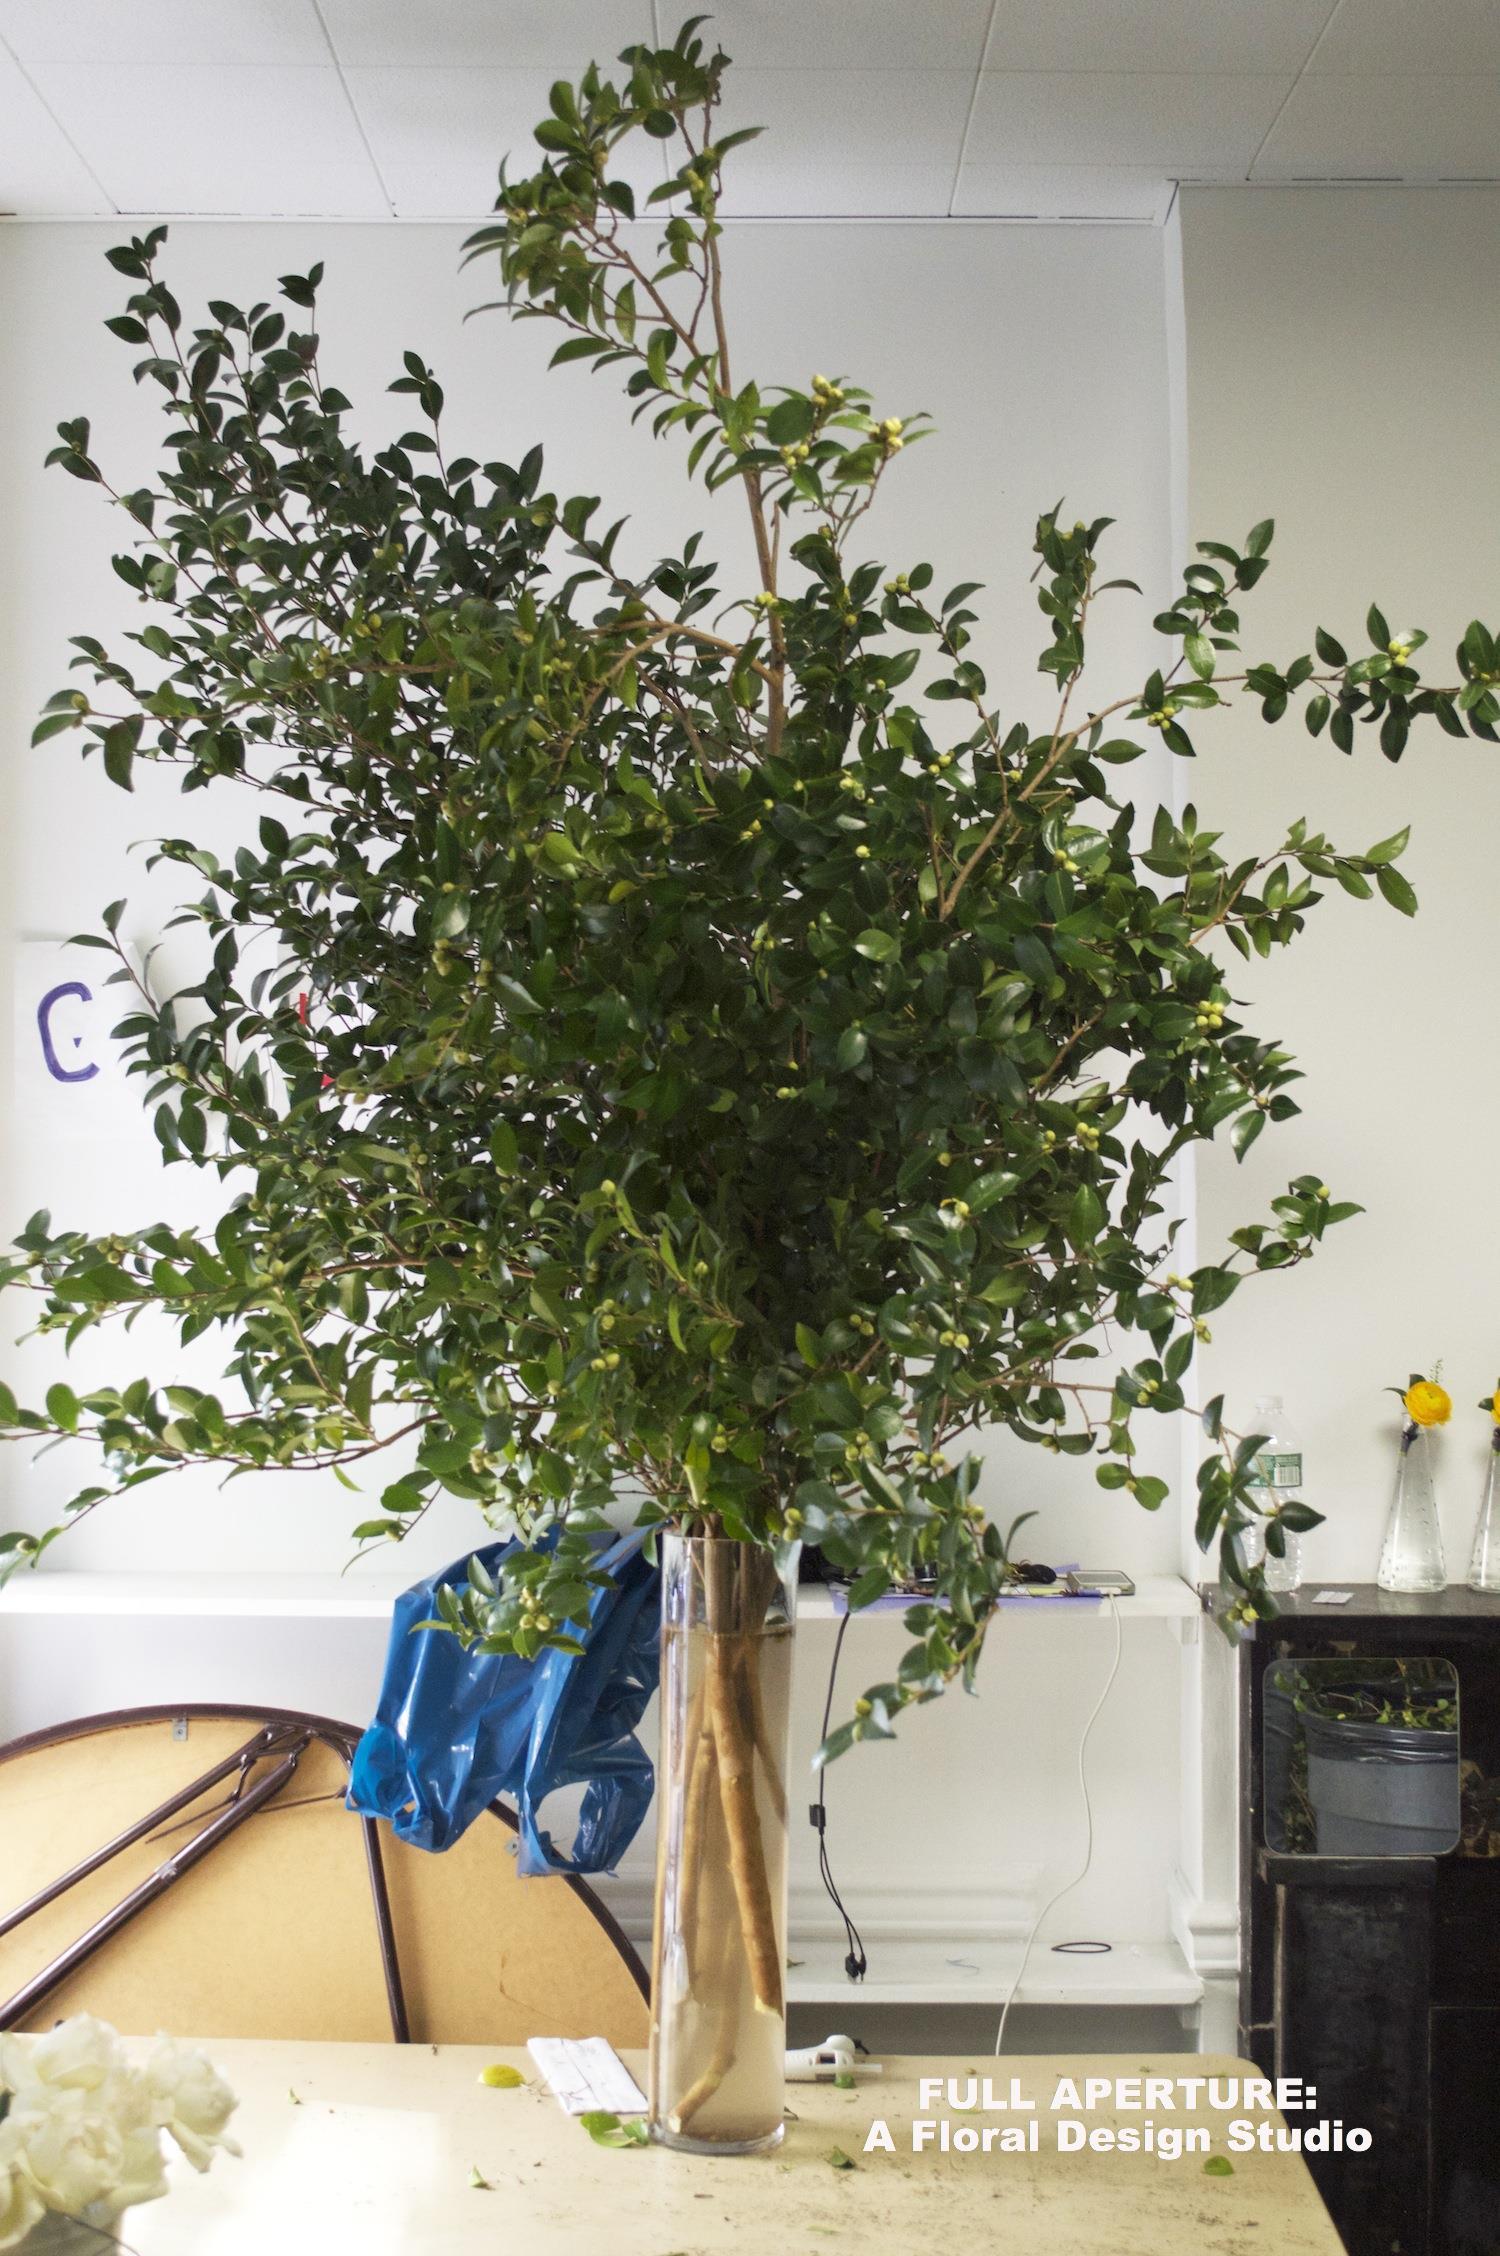 Branch Preview Full Aperture Floral Design.jpg